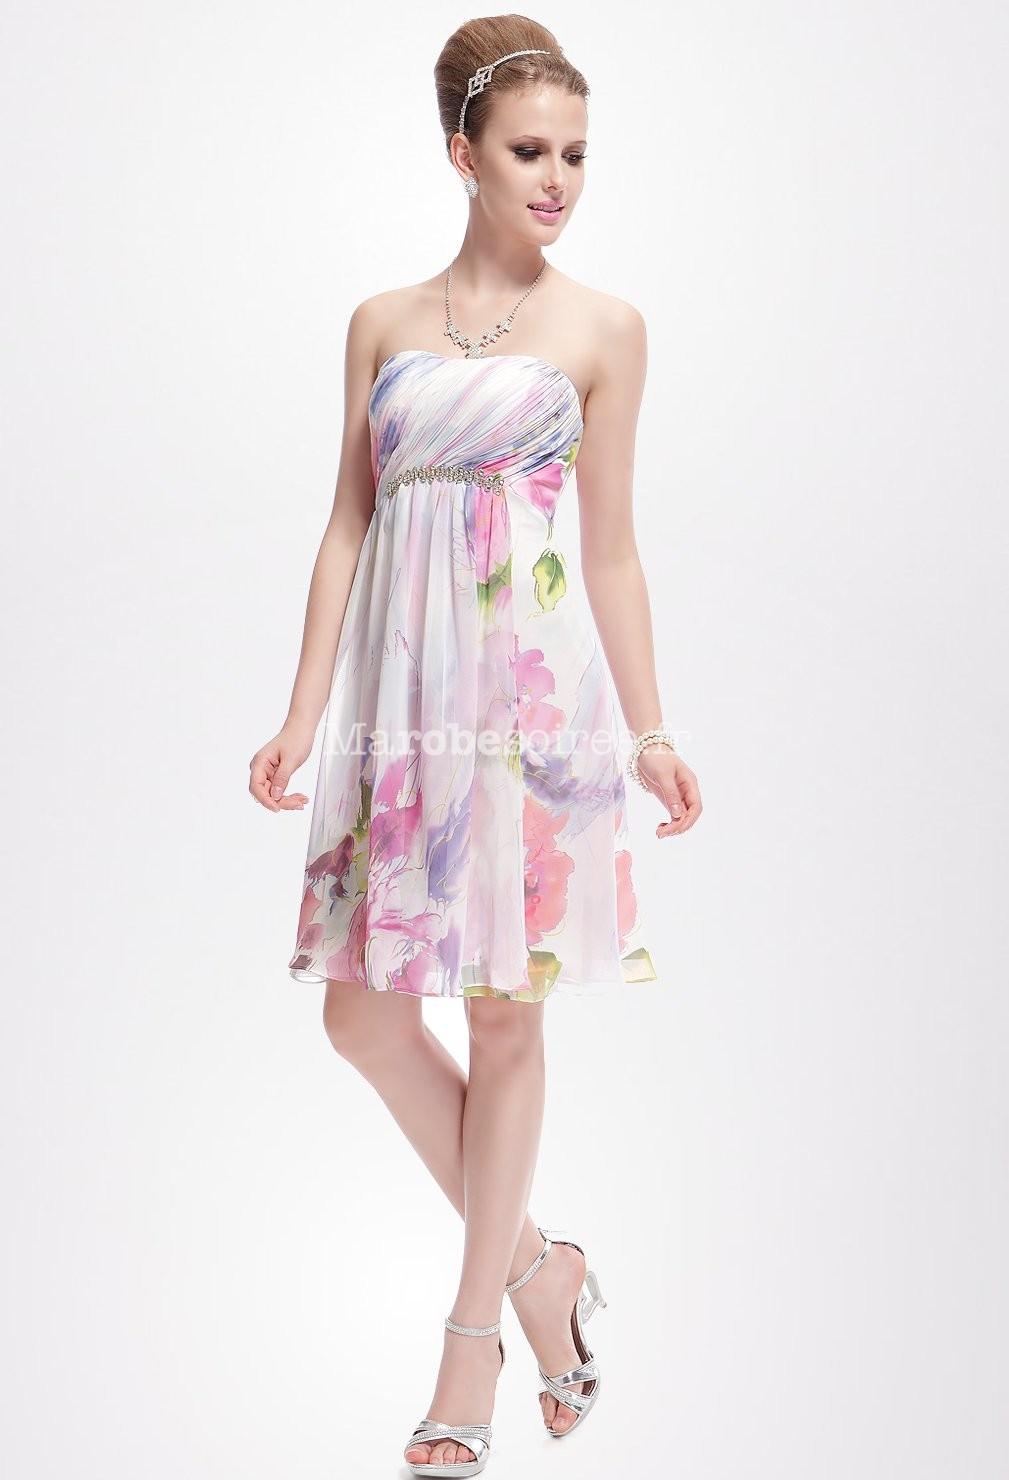 Robe de soiree fleurie courte